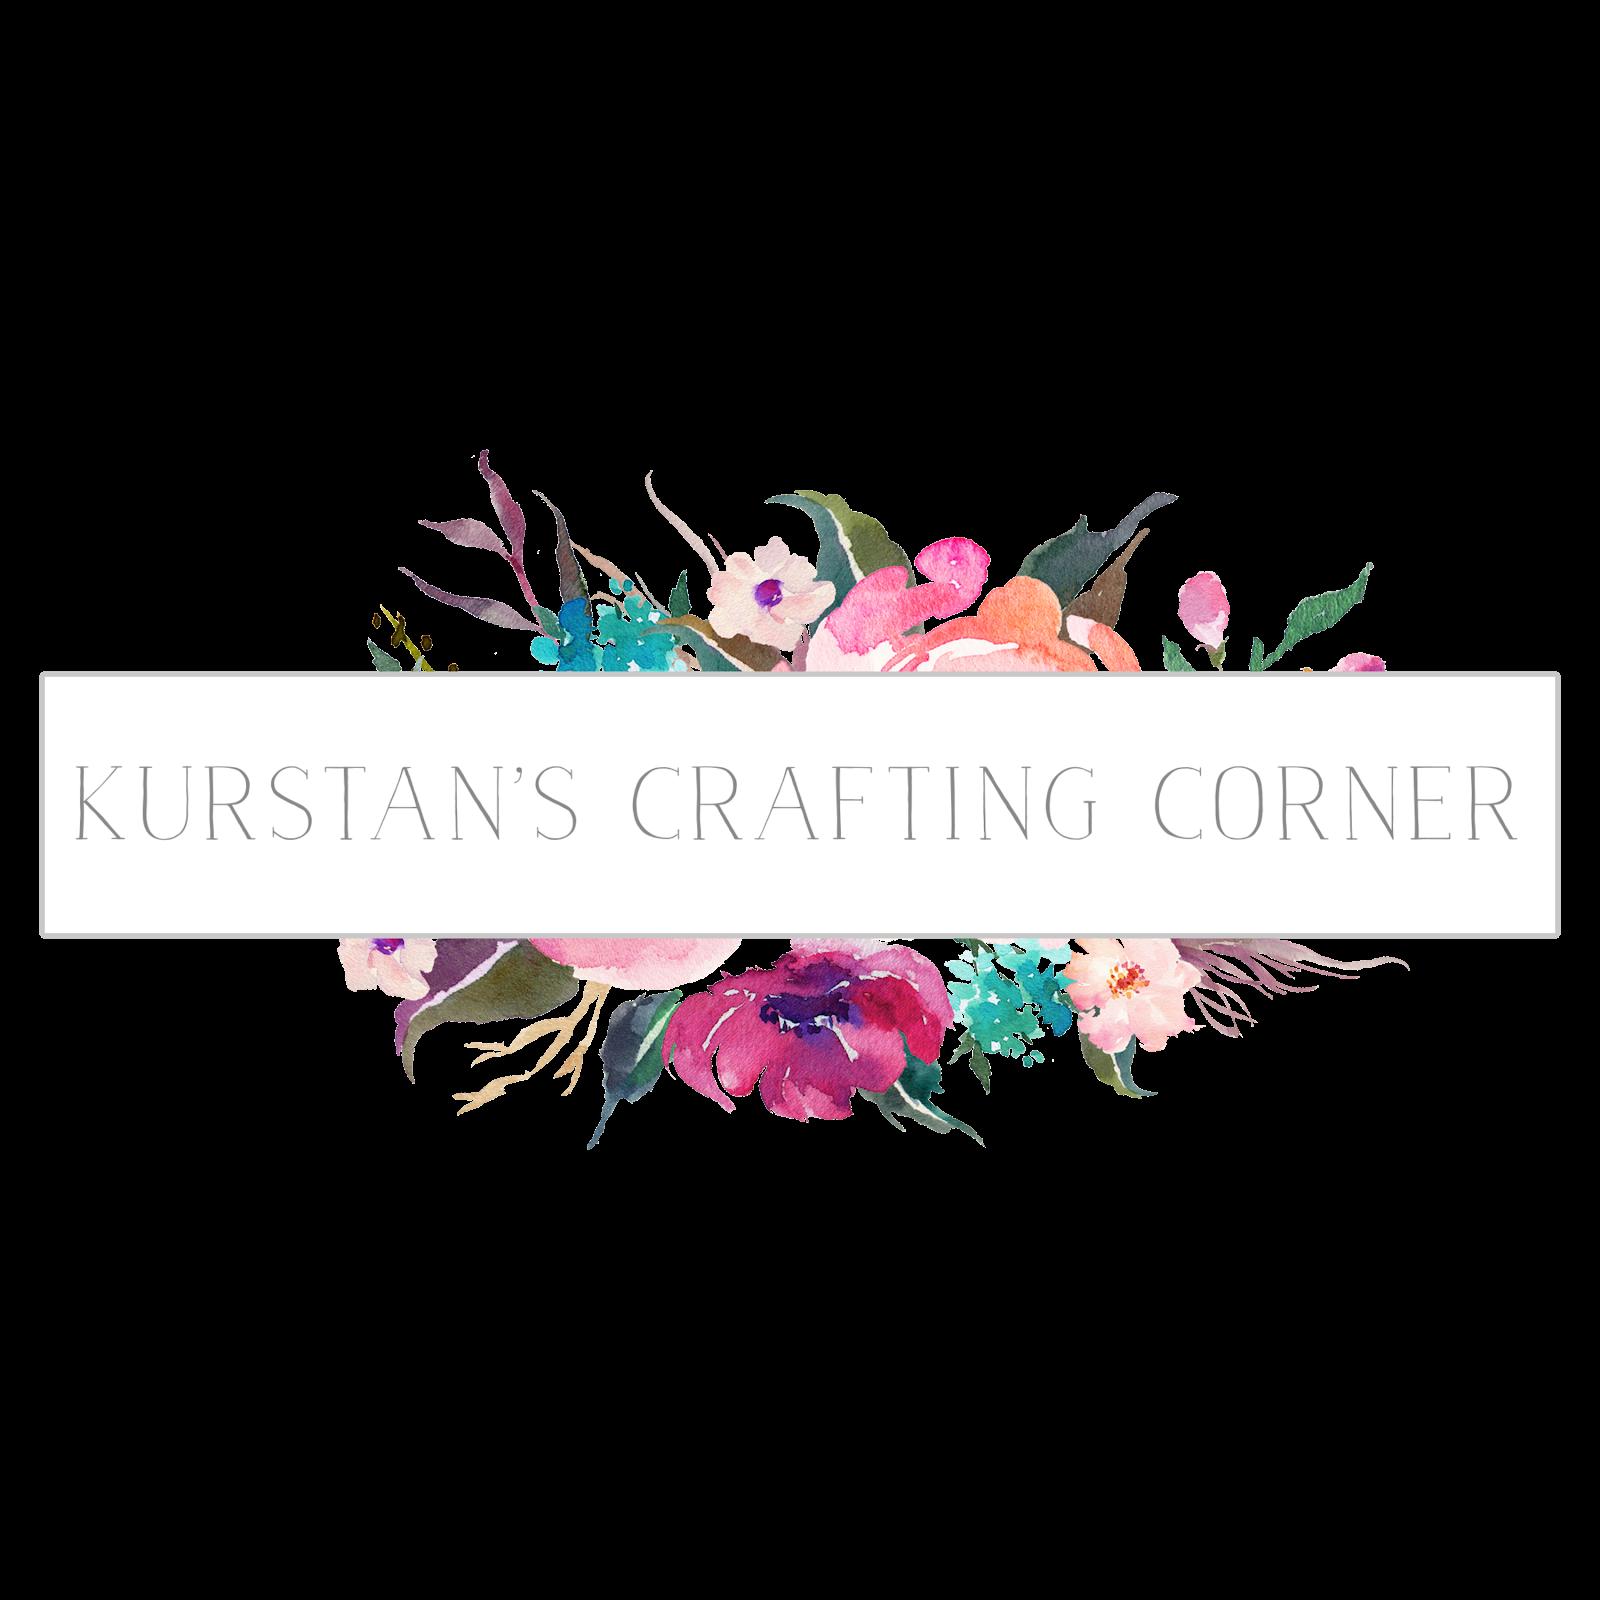 Kurstan's Crafting Corner